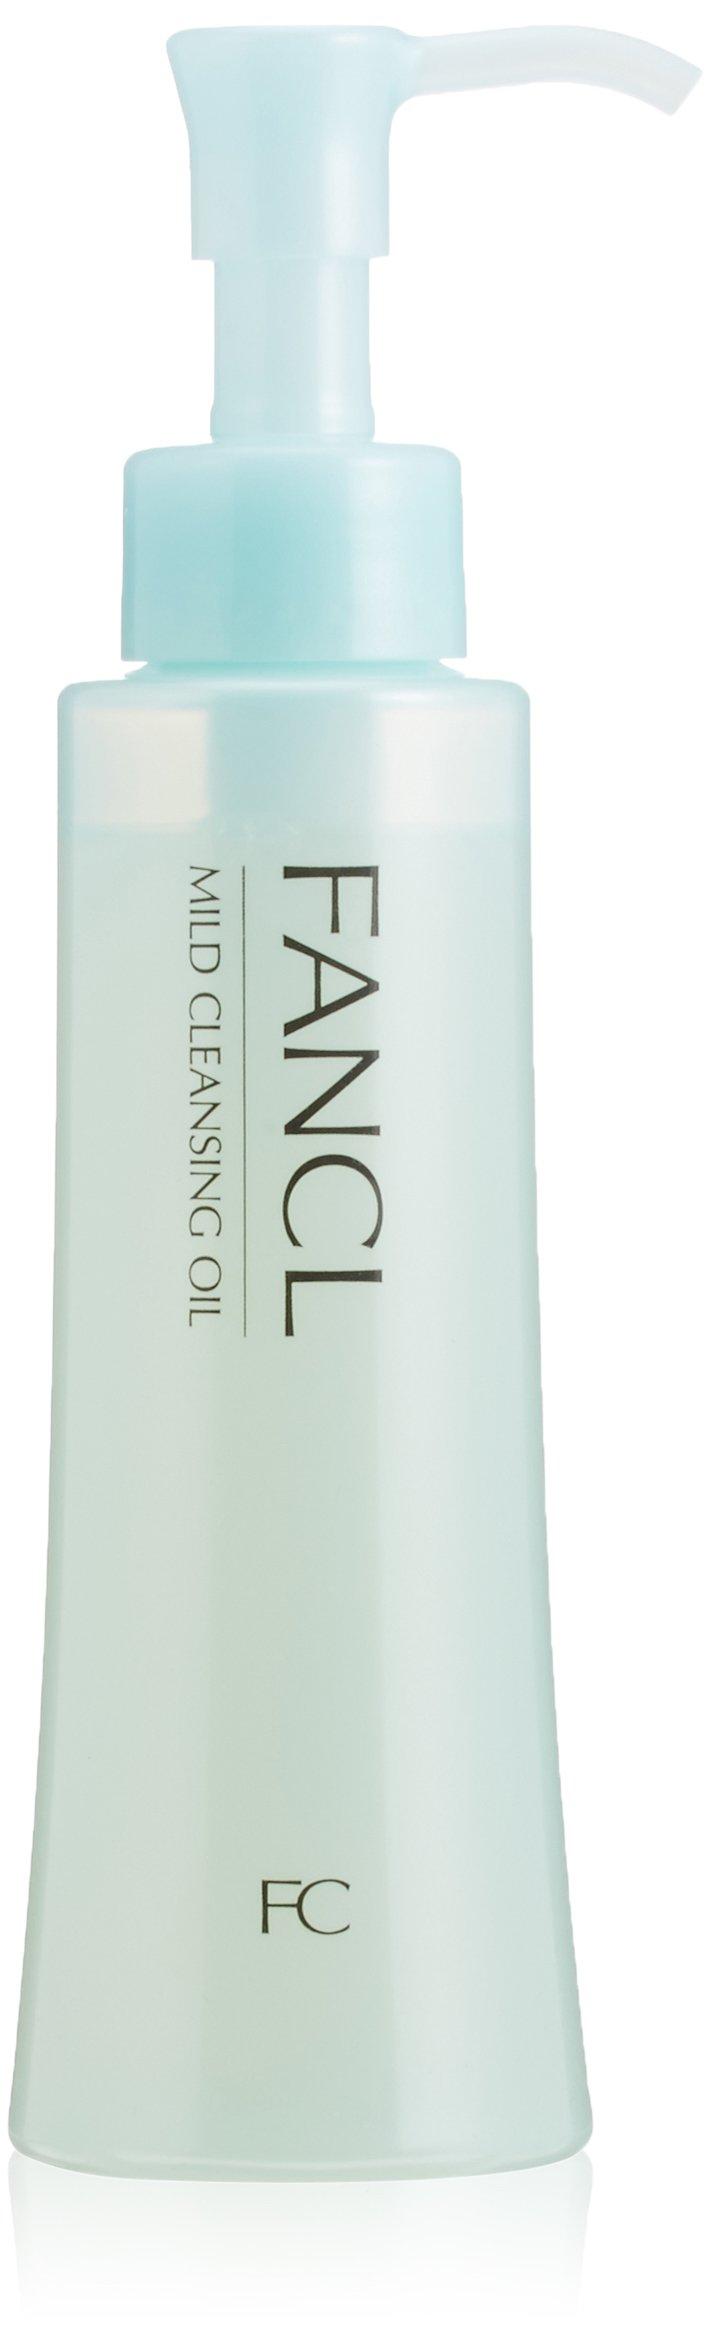 Fancl Mild Cleansing Oil 120ml by Fancl